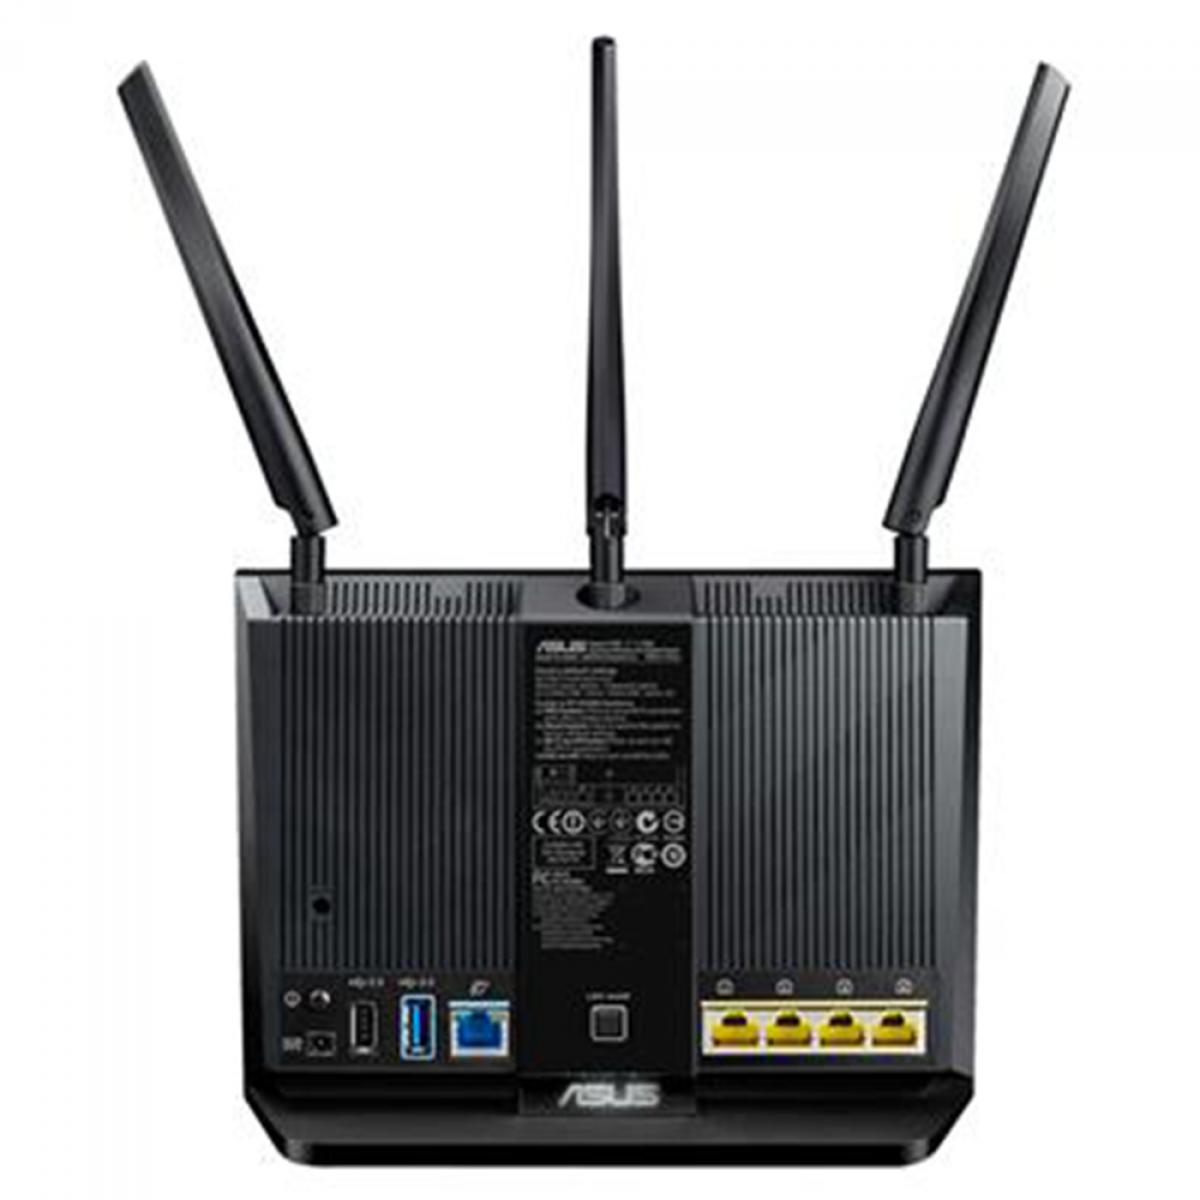 Roteador Asus, RT-AC68U, Wireless, AC1900 Dual-Band, 5G, AiMesh, Gigabit Router, 90IG00C3-MY8G00